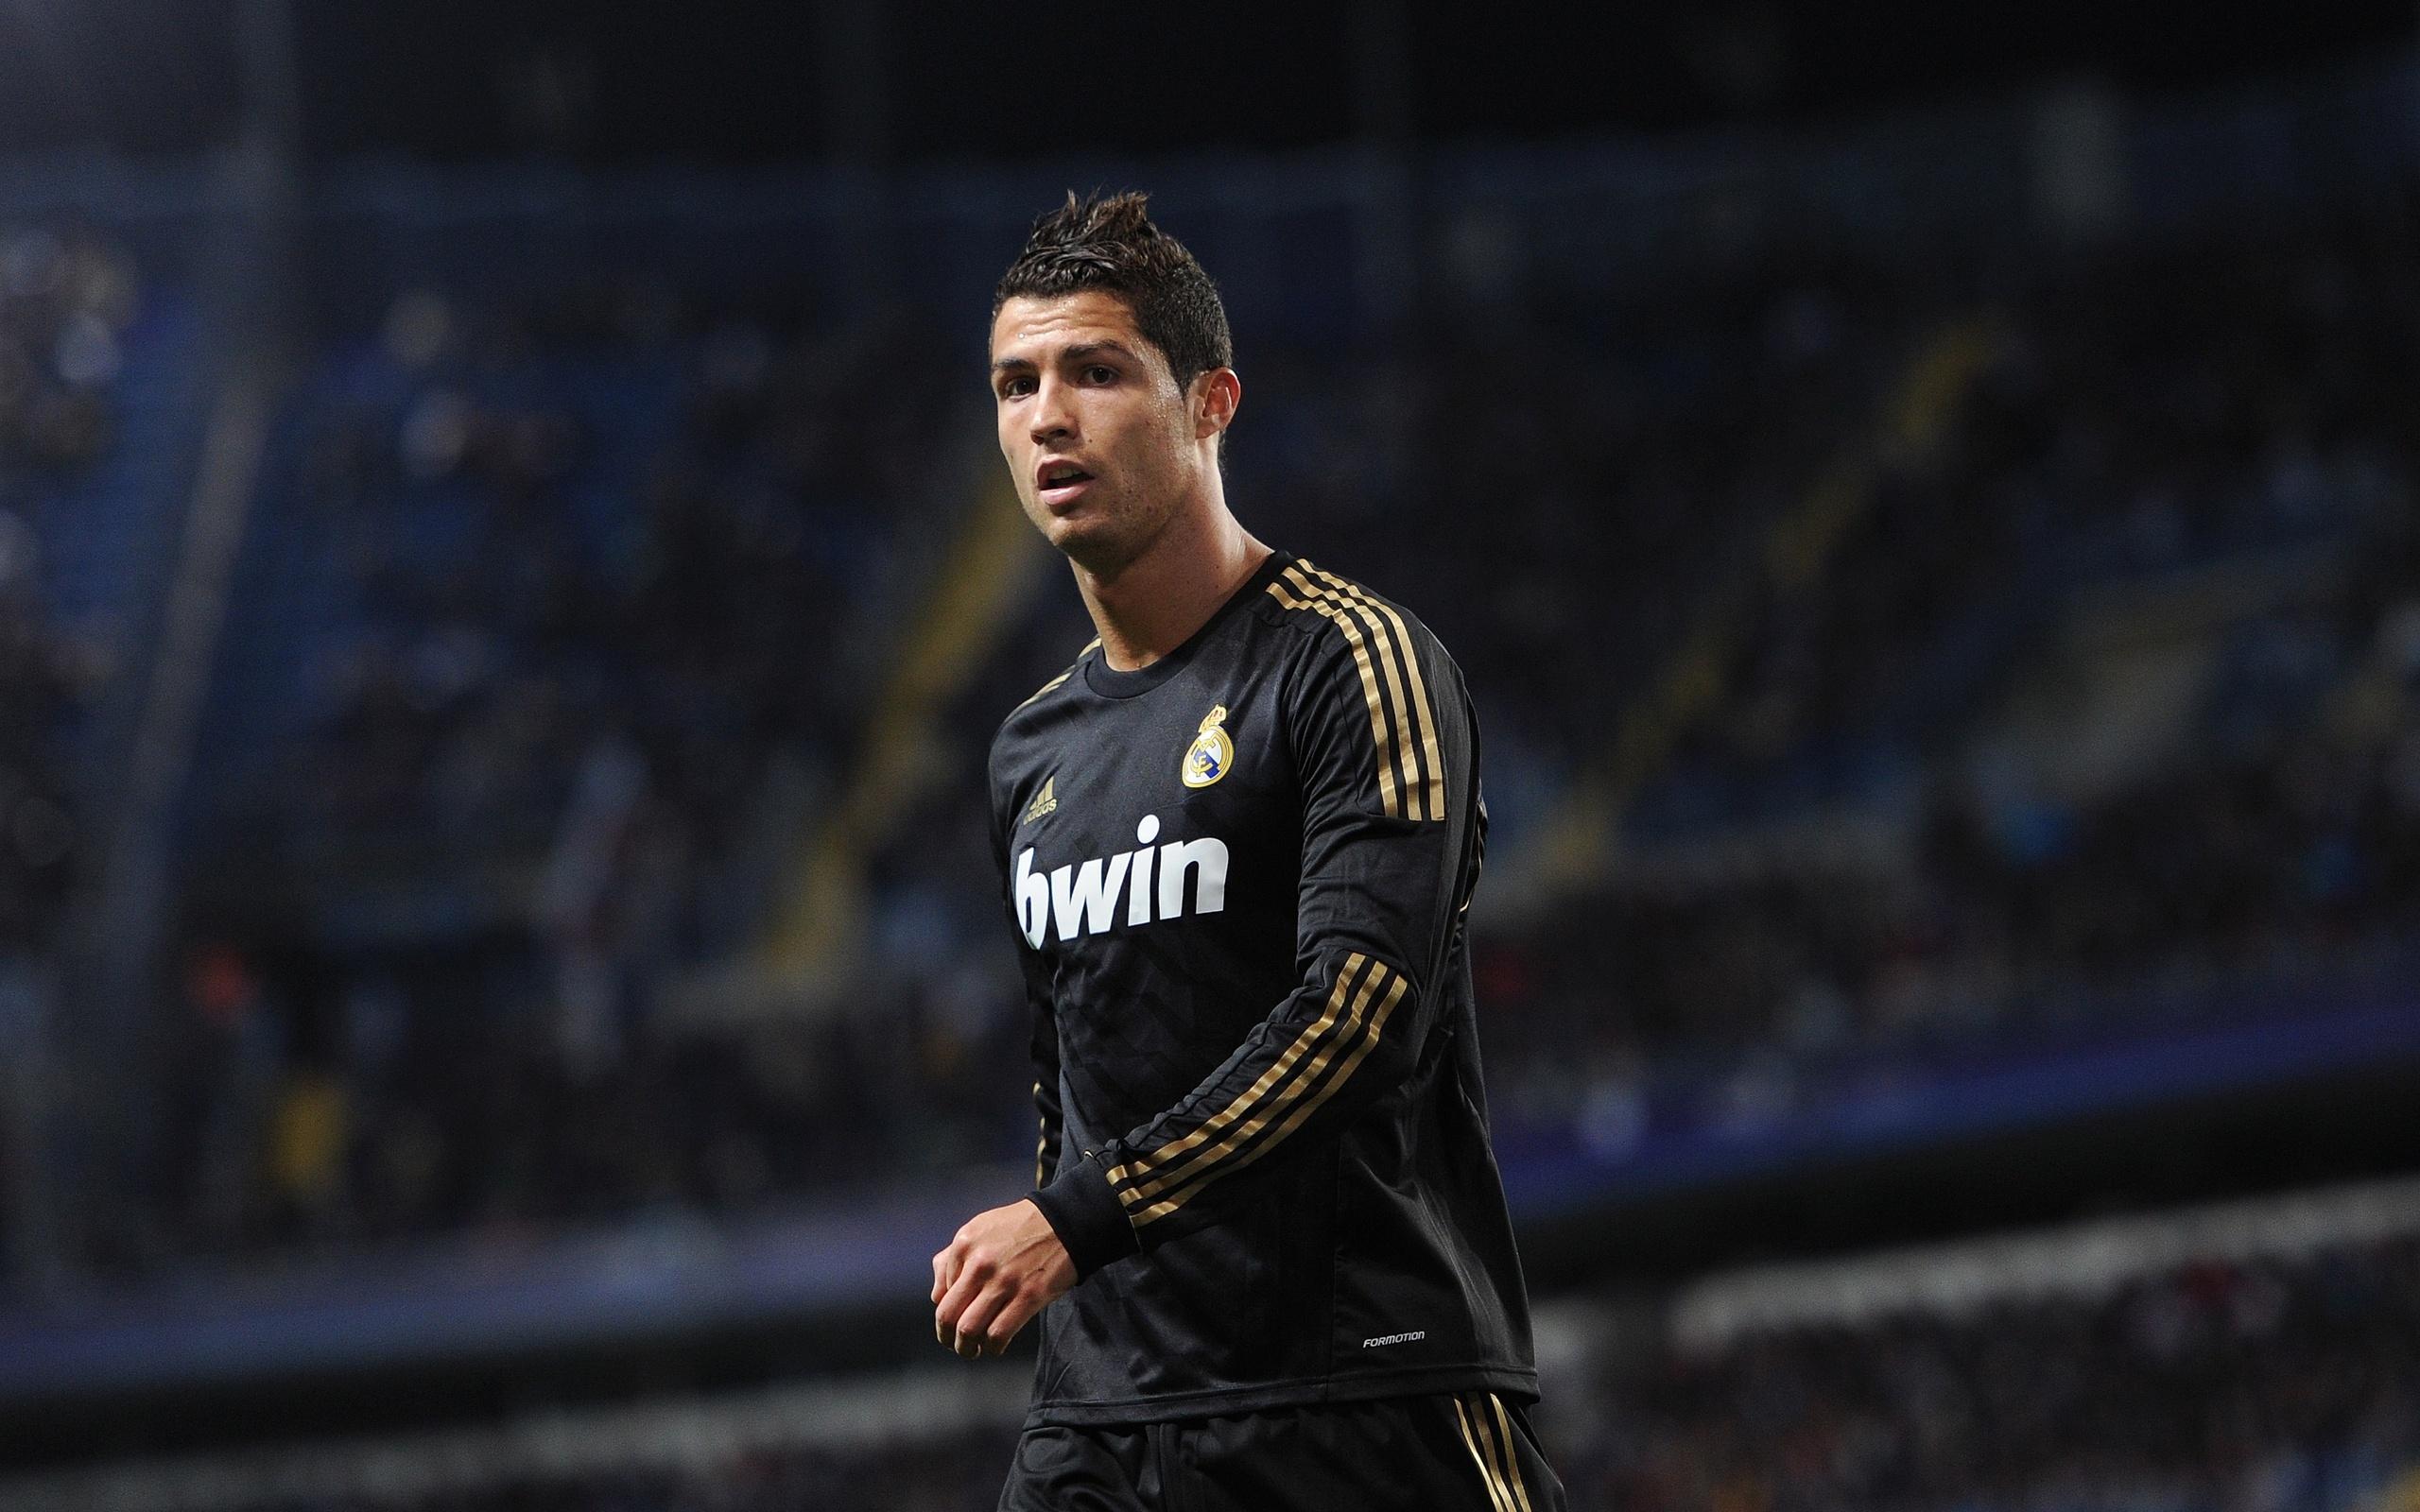 Обои ronaldo, Real madrid, cristiano ronaldo, football, Cristiano. Спорт foto 15